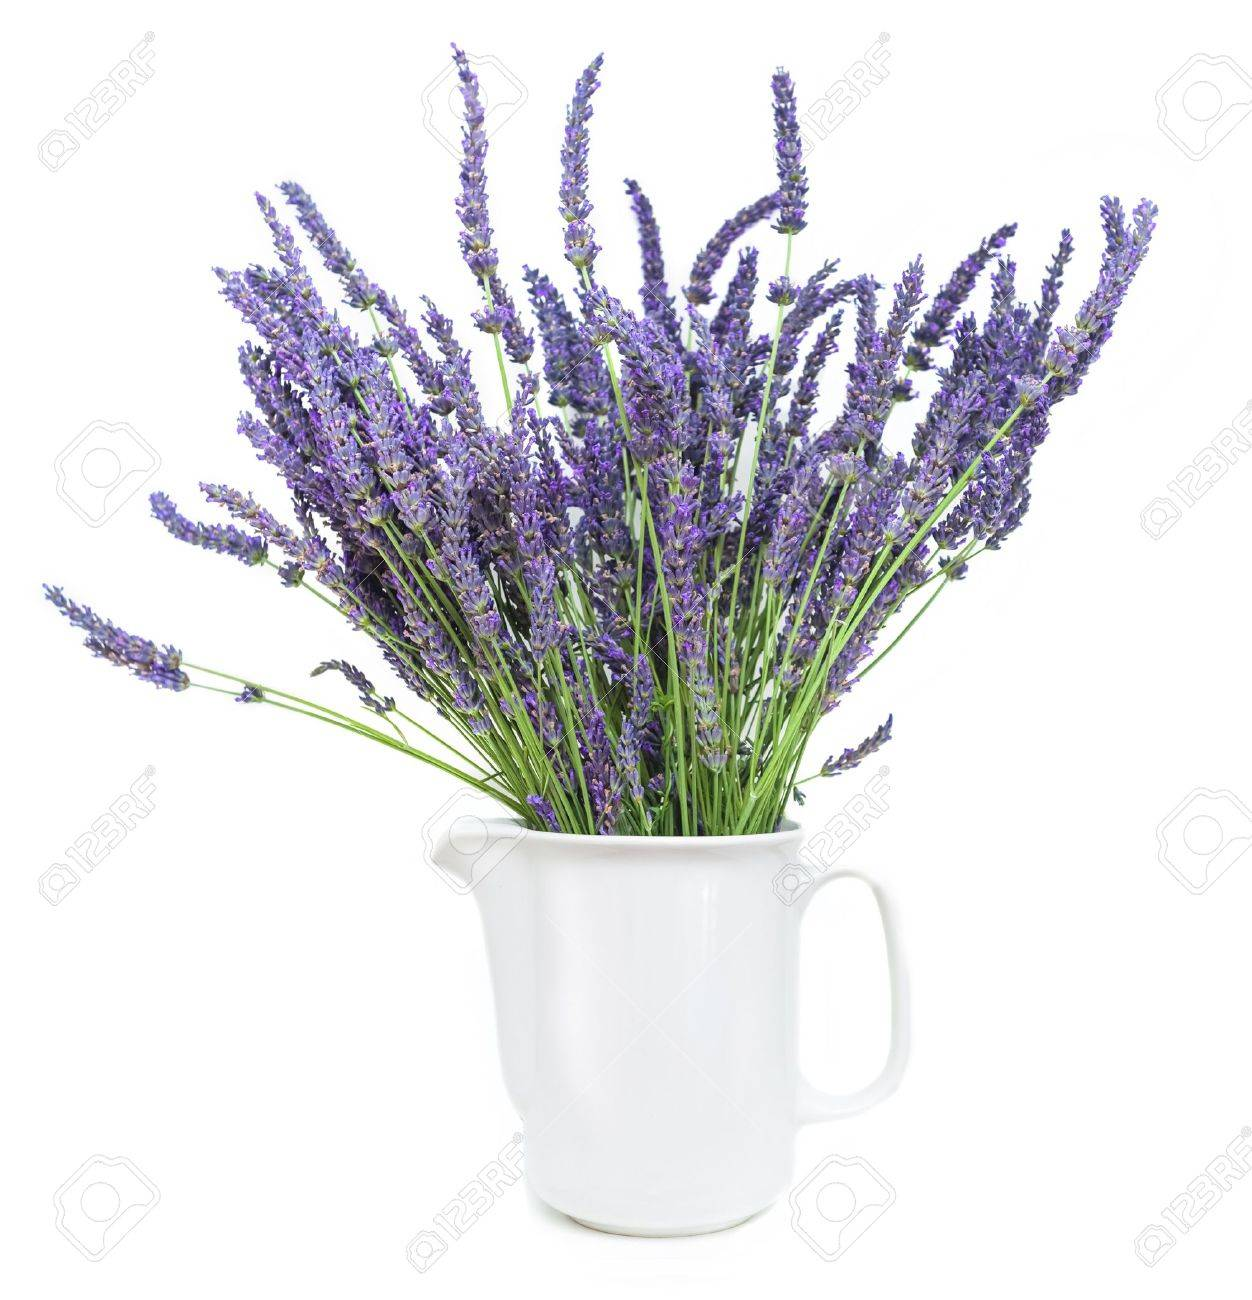 19118845-lavender-Stock-Photo-lavender-pot-plant.jpg